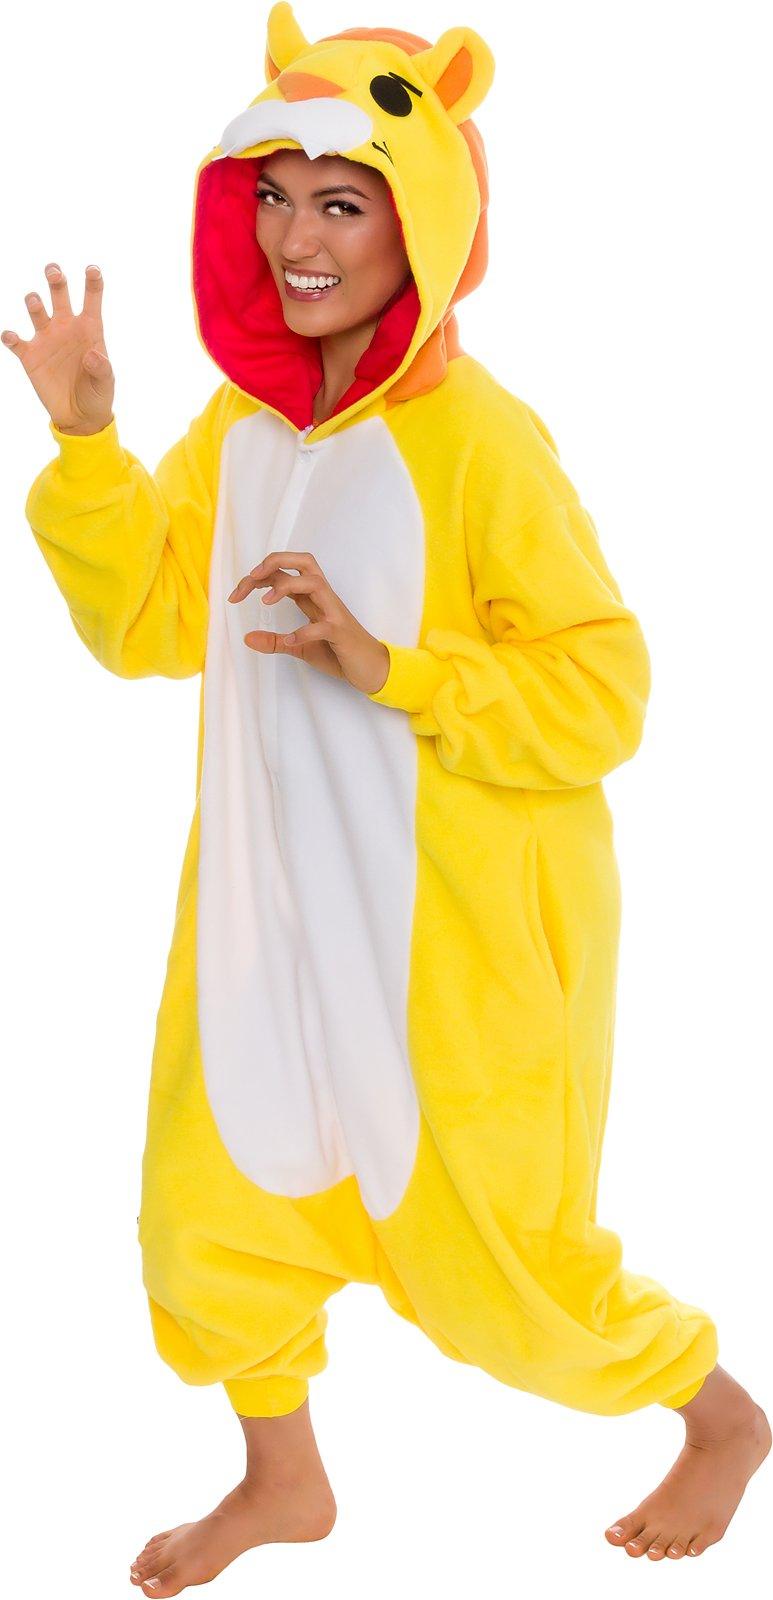 Silver Lilly Unisex Adult Pajamas - Plush One Piece Cosplay Lion Animal Costume